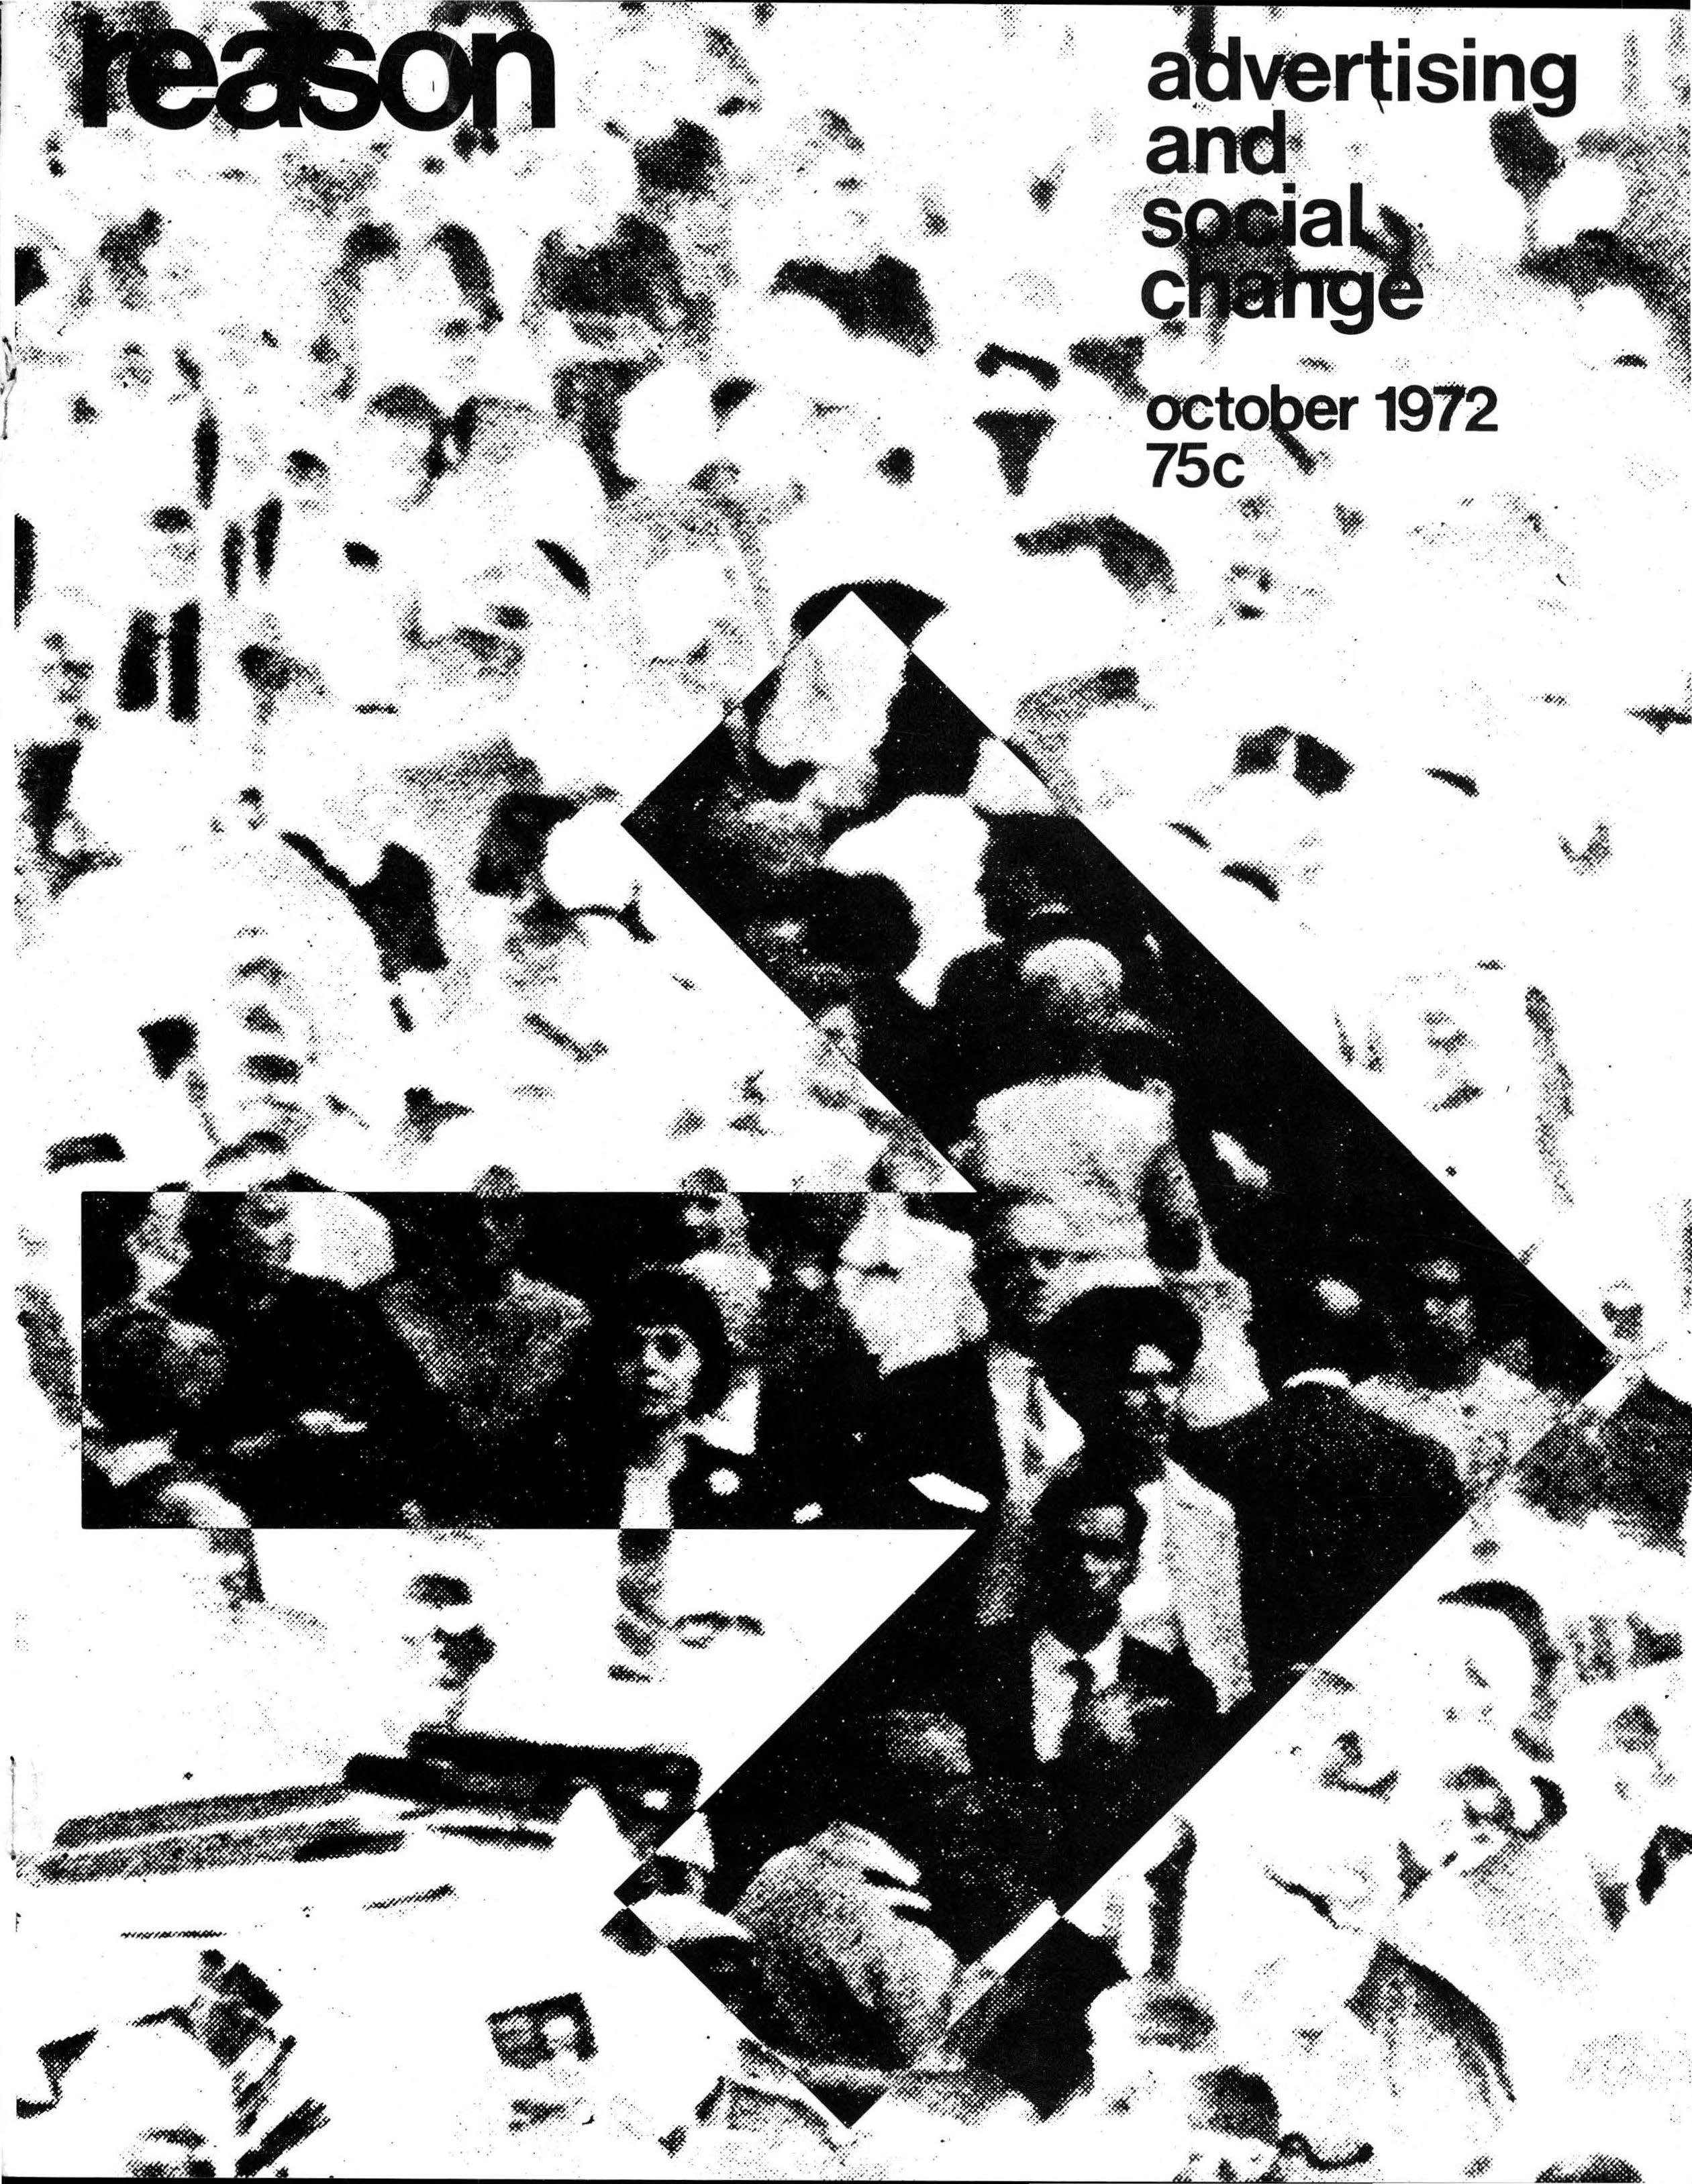 Reason Magazine, October 1972 cover image